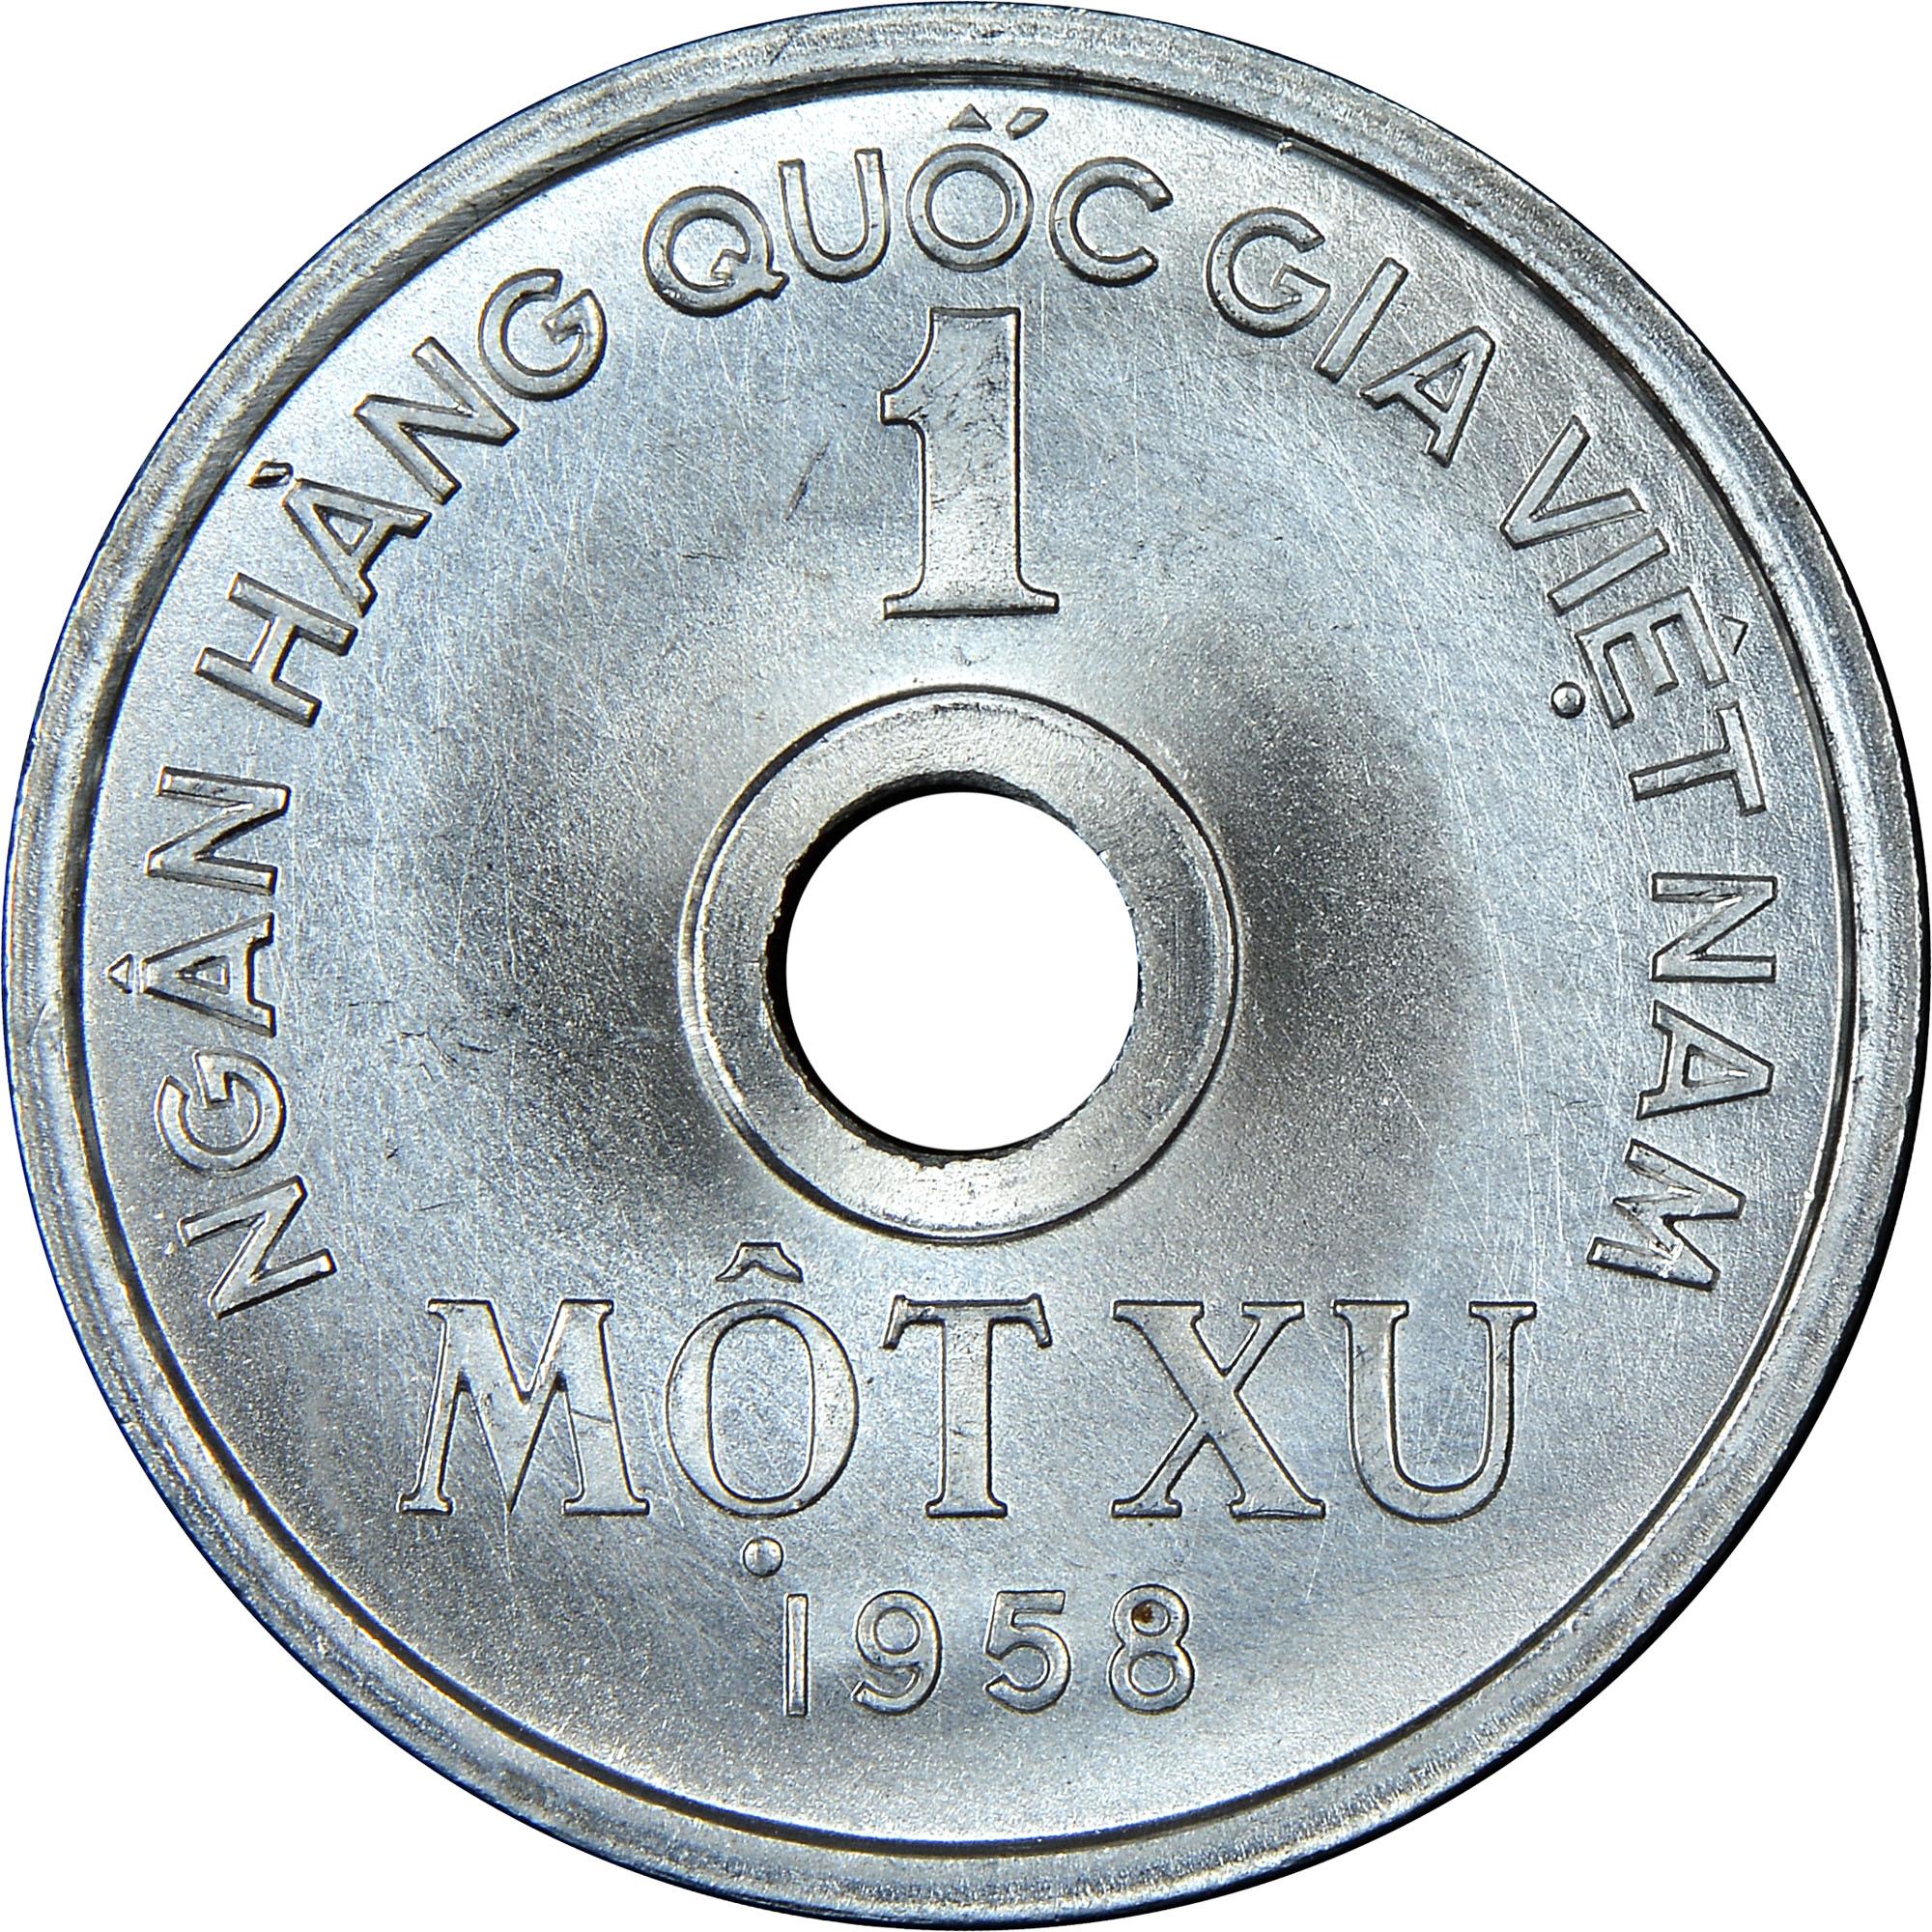 Viet Nam NORTH VIET NAM Xu reverse